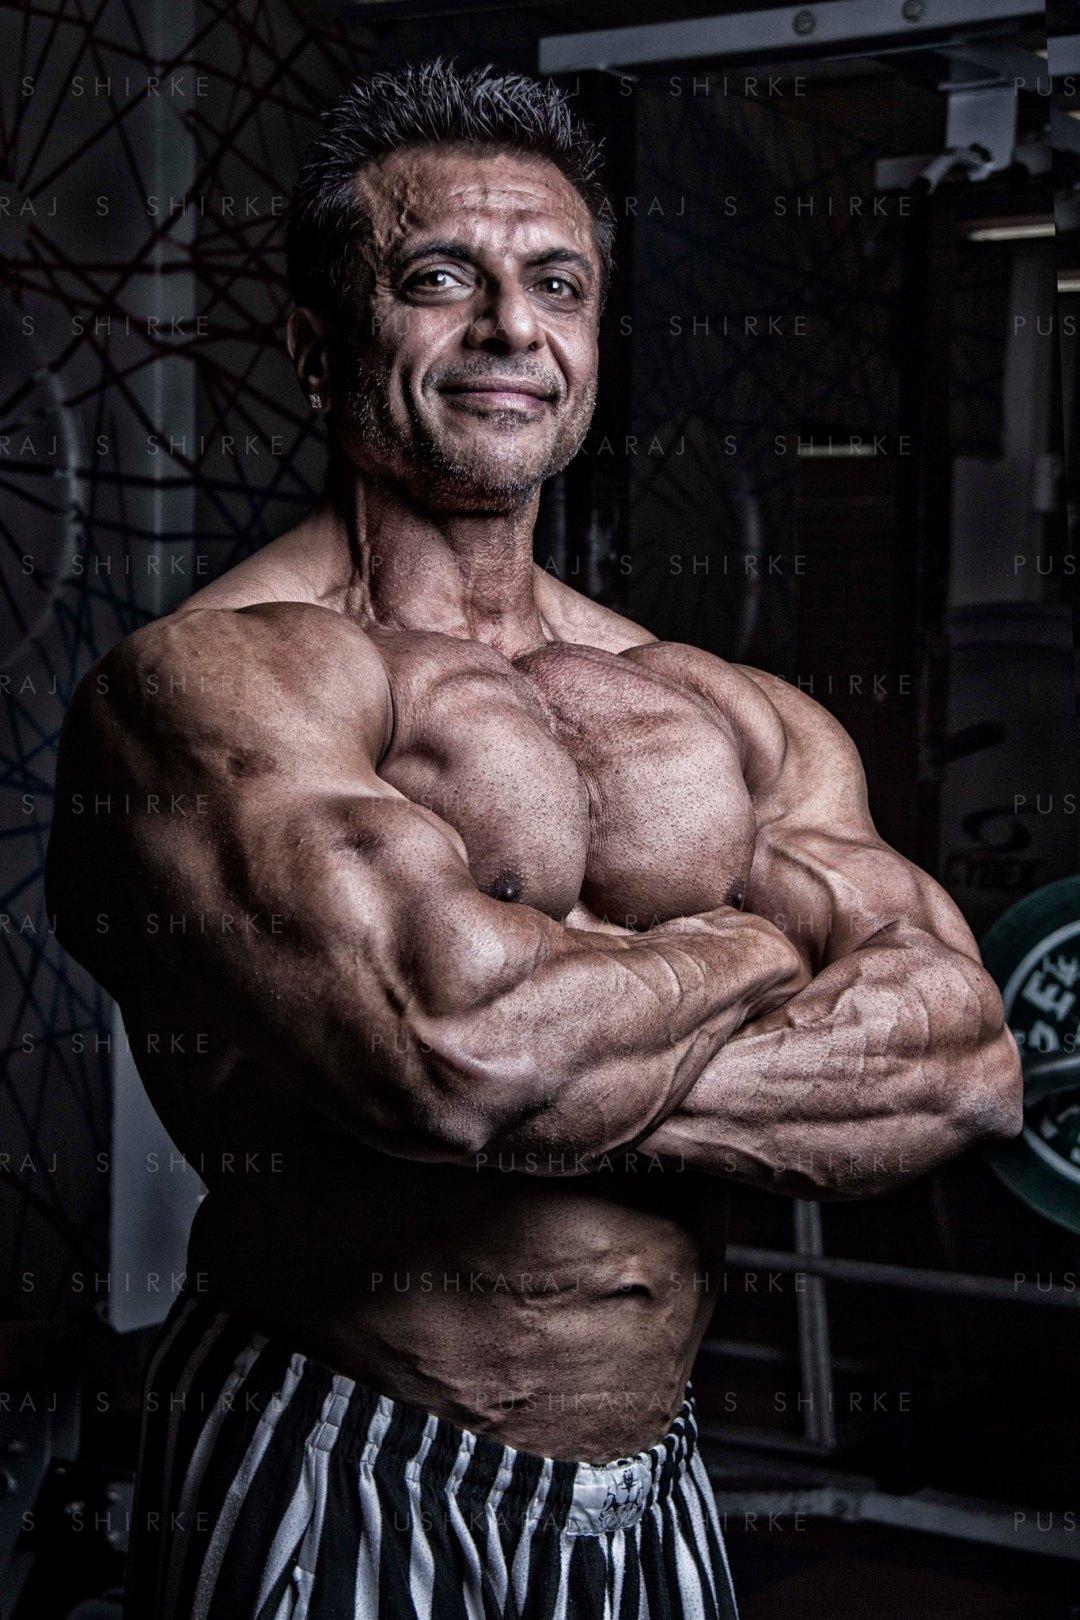 nizar-dawoodani-pushkaraj-s-shirke-fitness-photographer